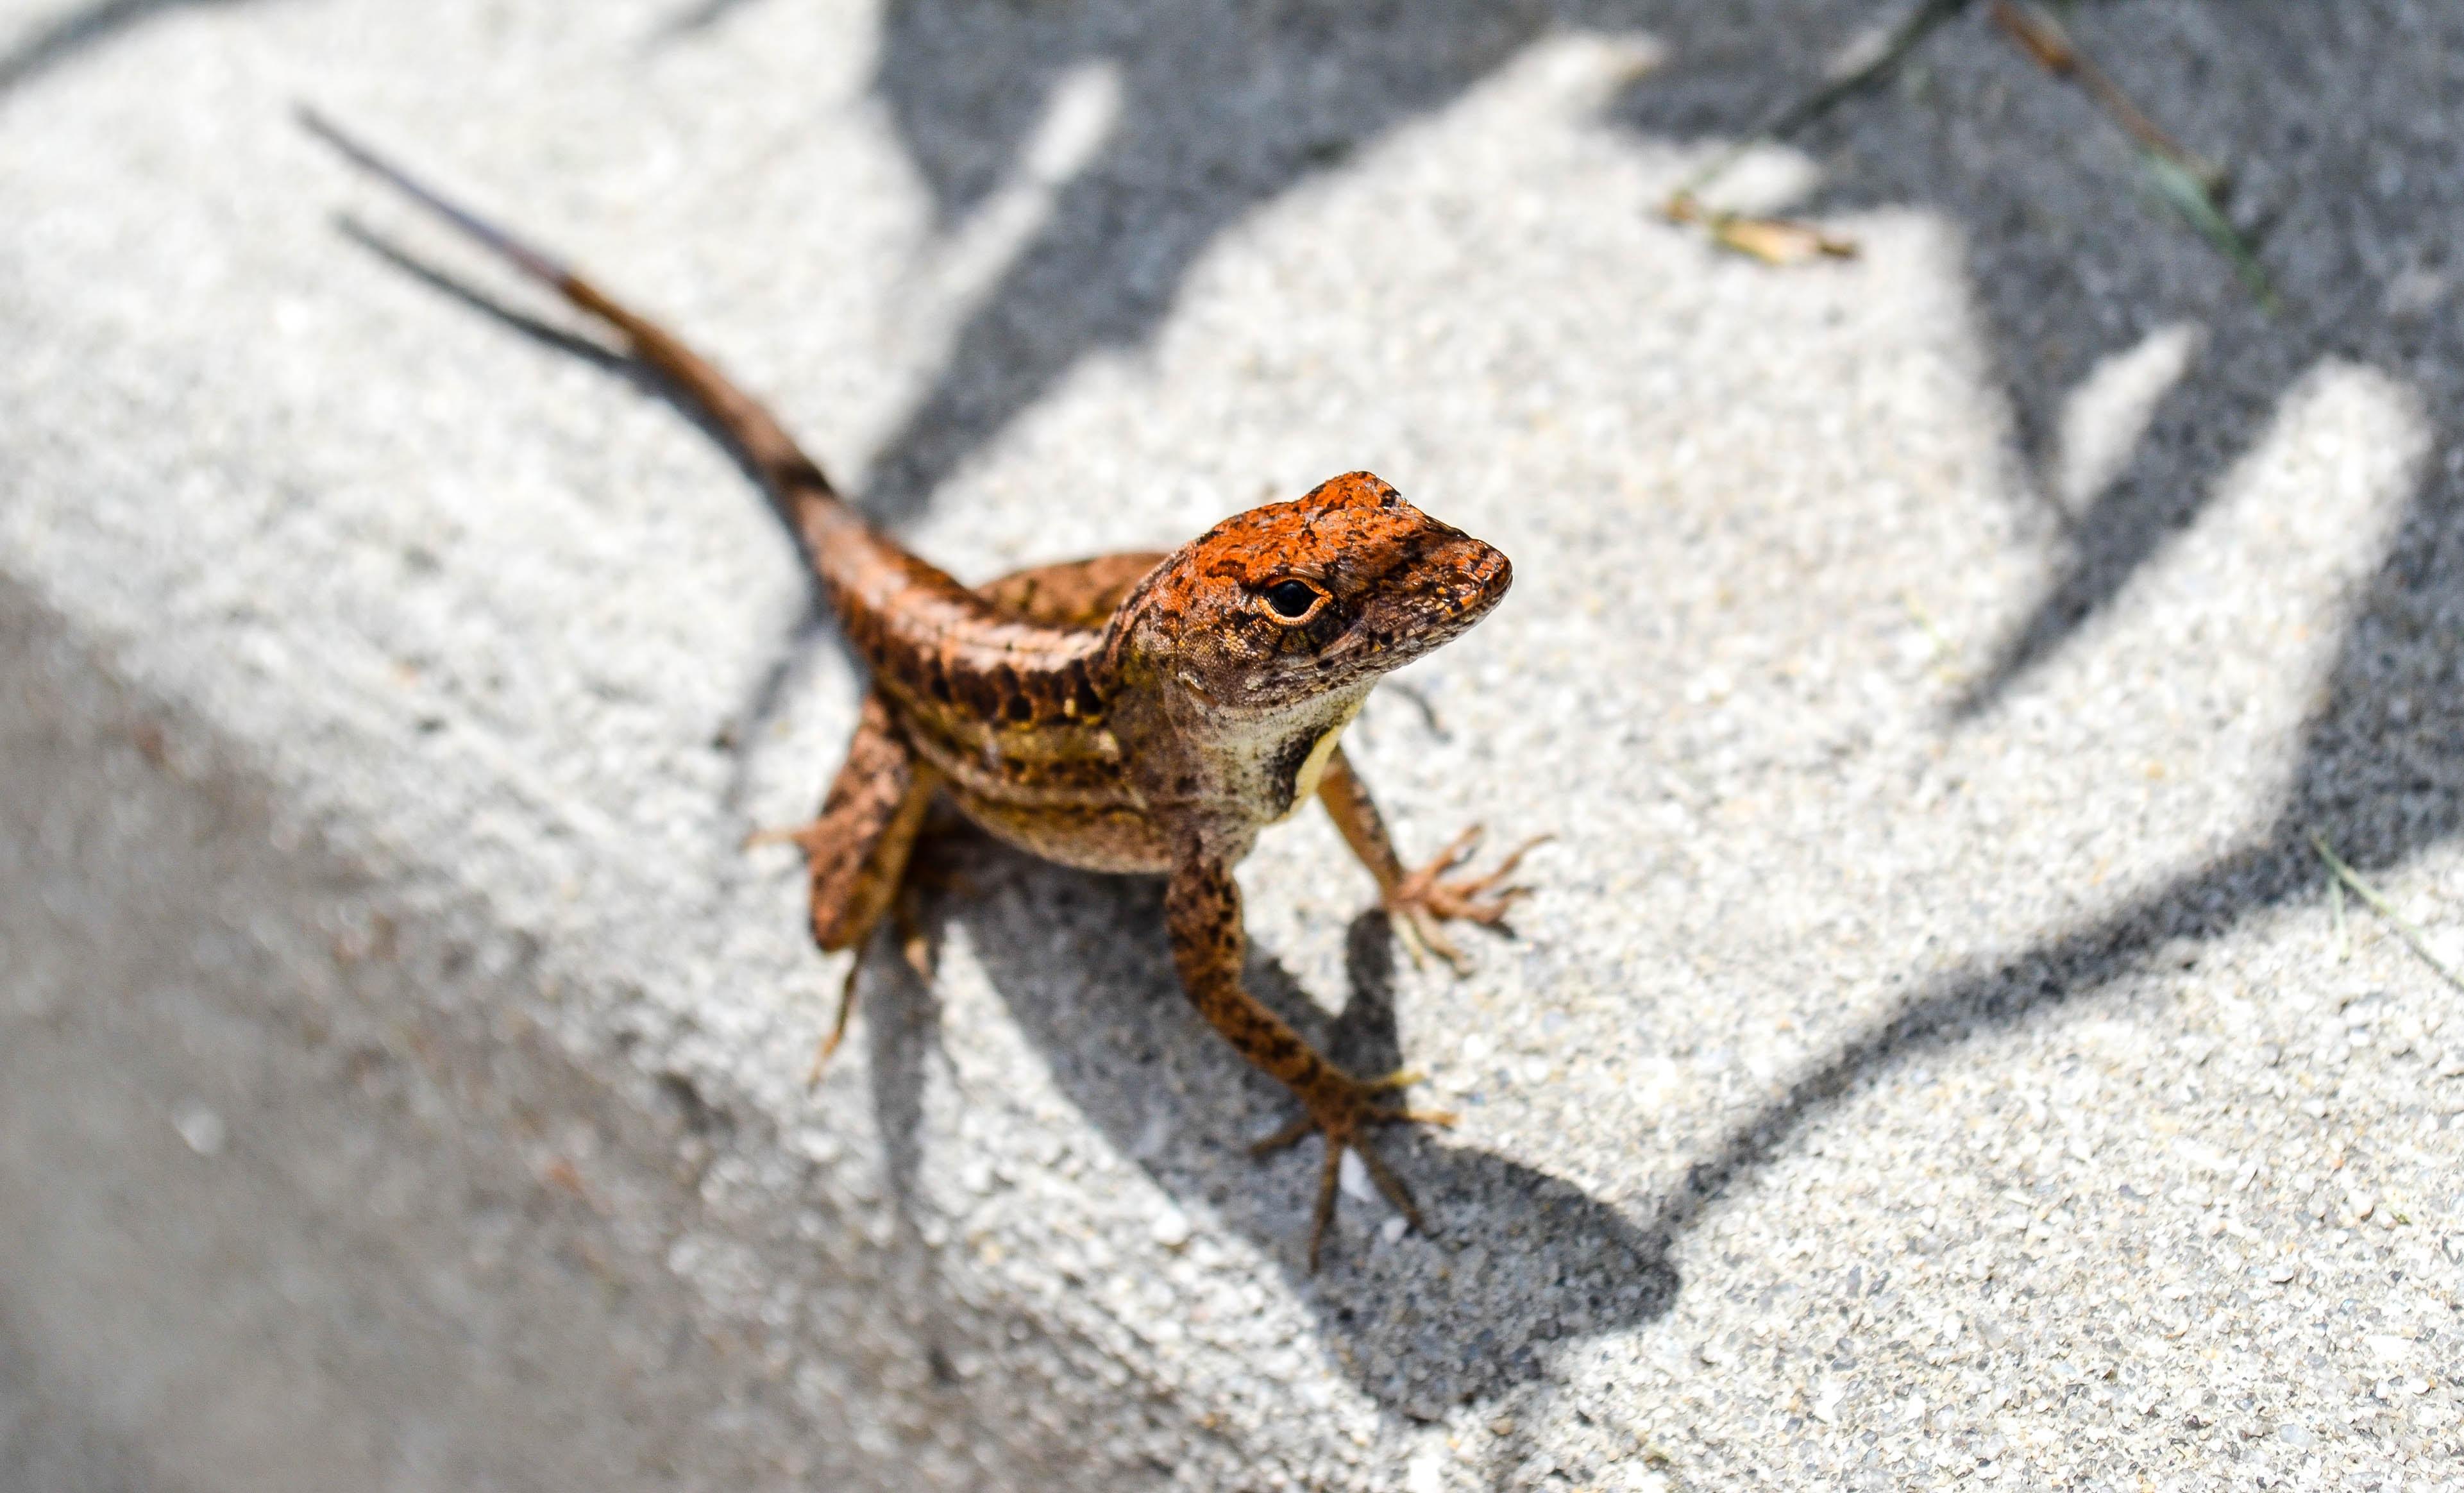 Portrait of a lizard alone on concrete